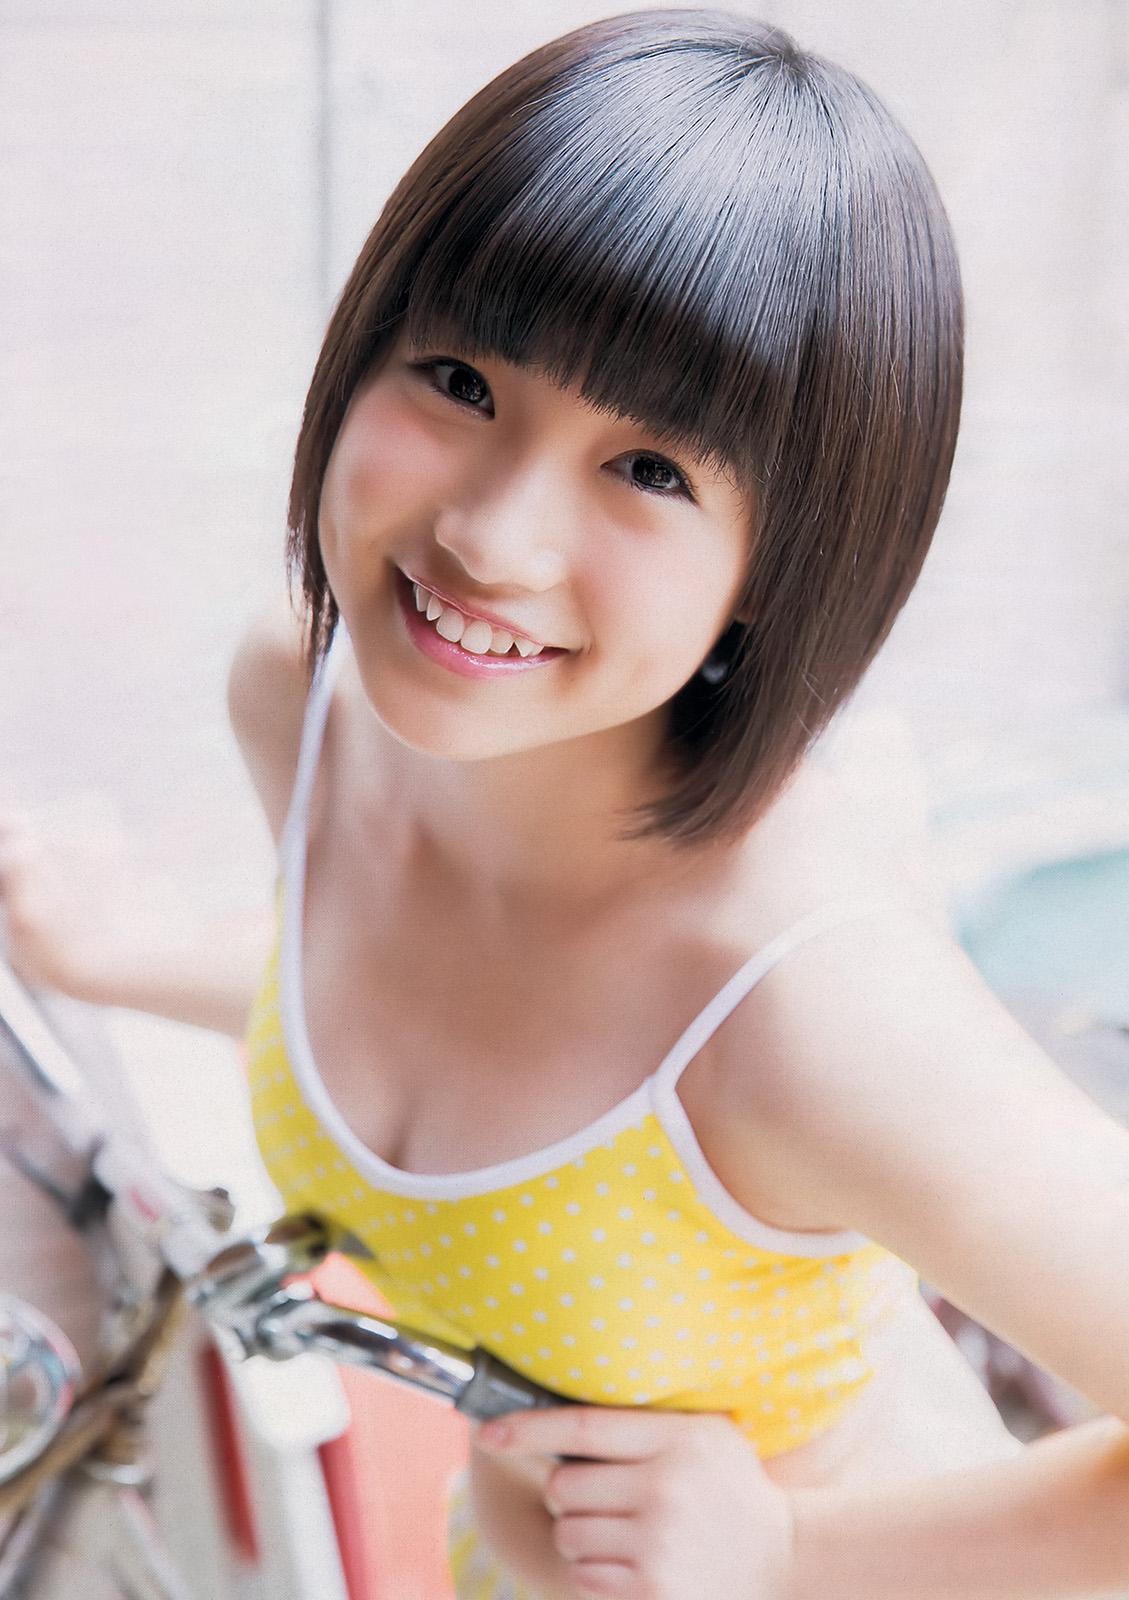 HKT48朝長美桜(19)の水着グラビア、キャバ嬢姿のエロ画像50枚・48枚目の画像